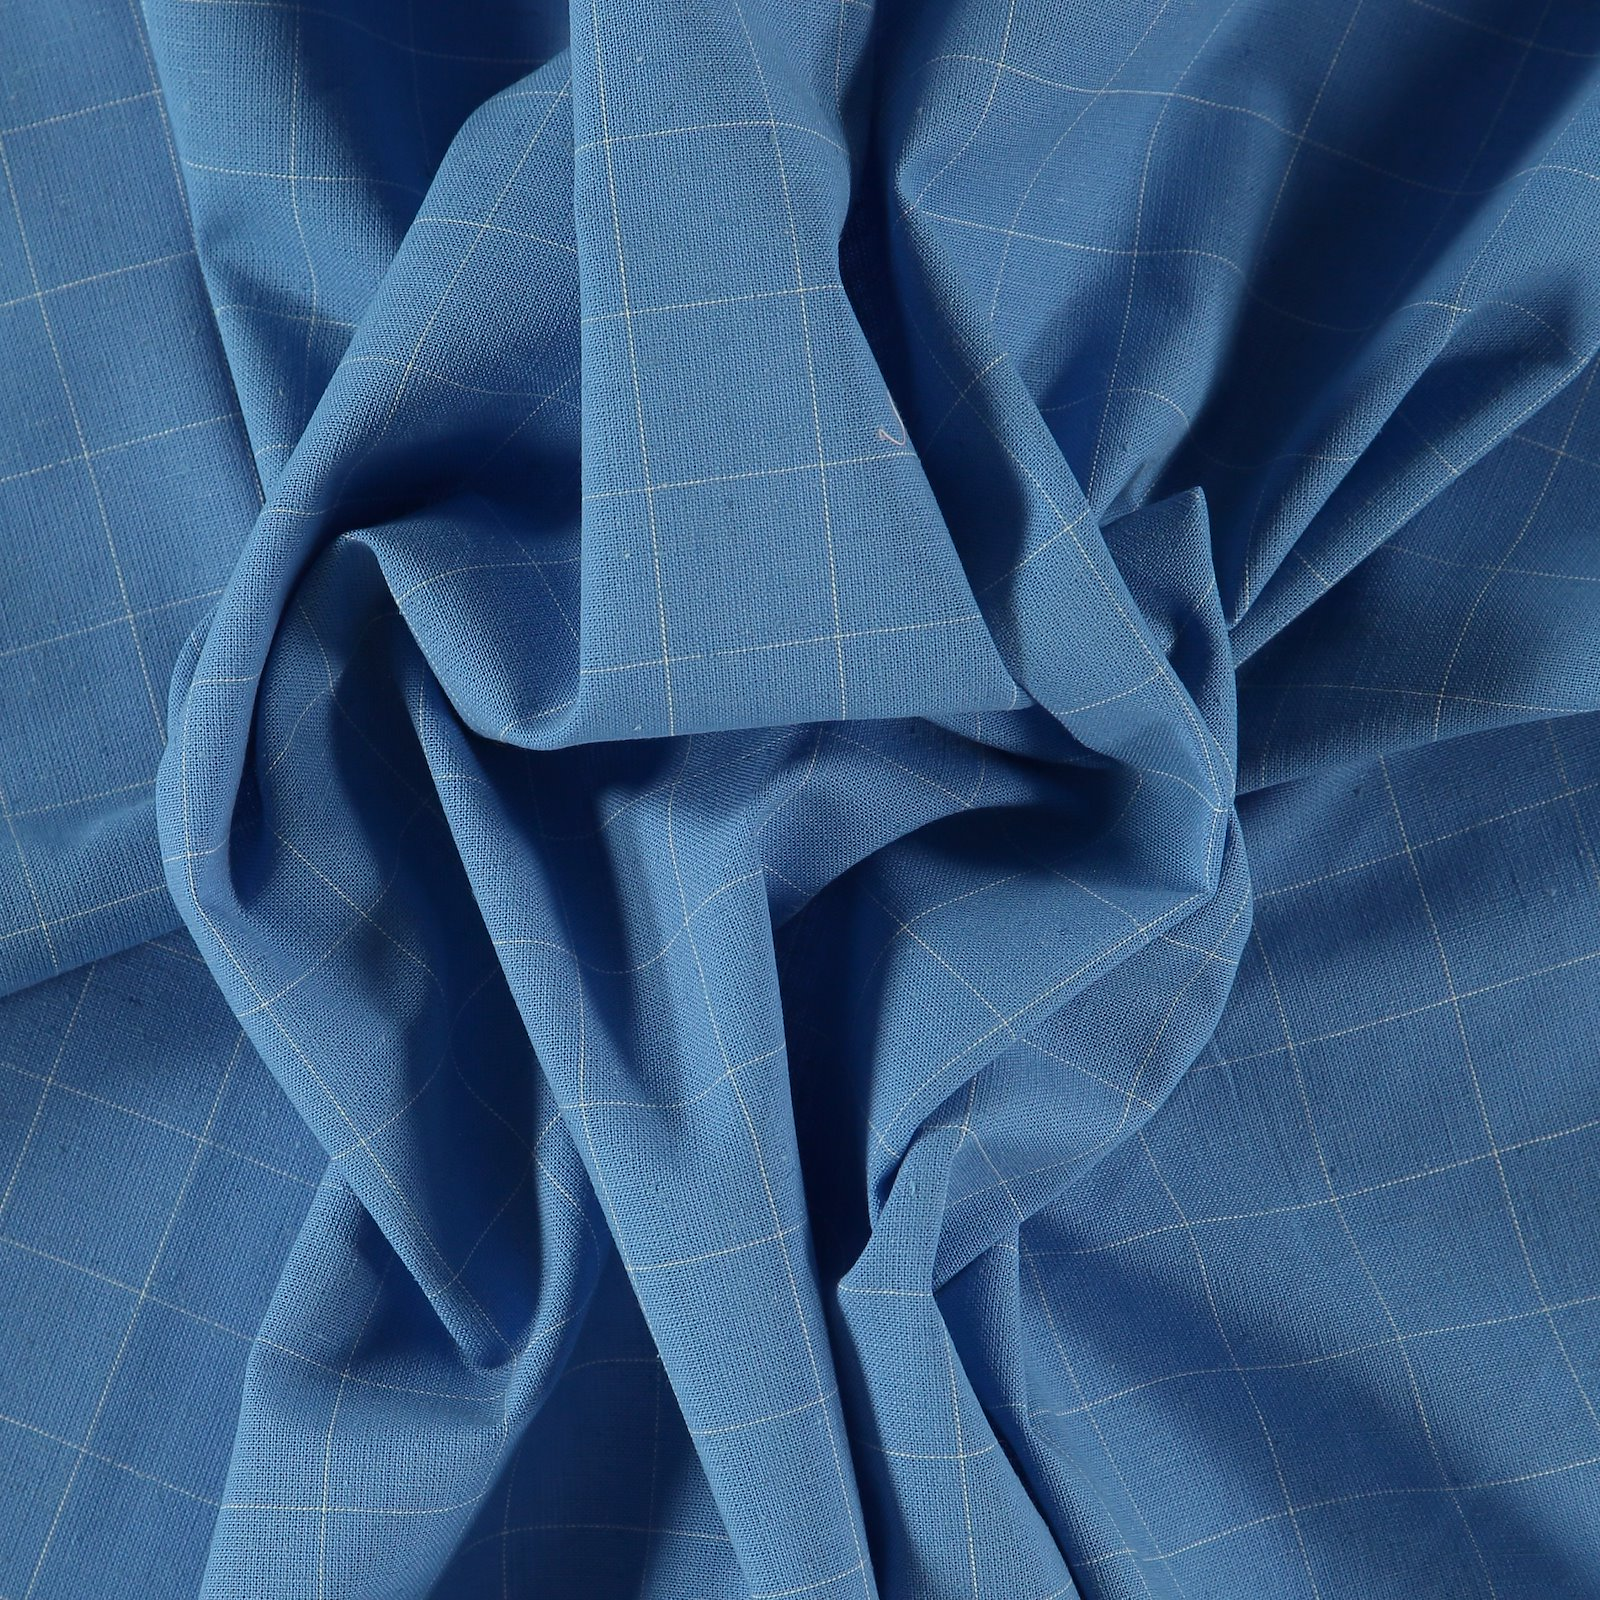 Yarn dyed check cobalt blue/white